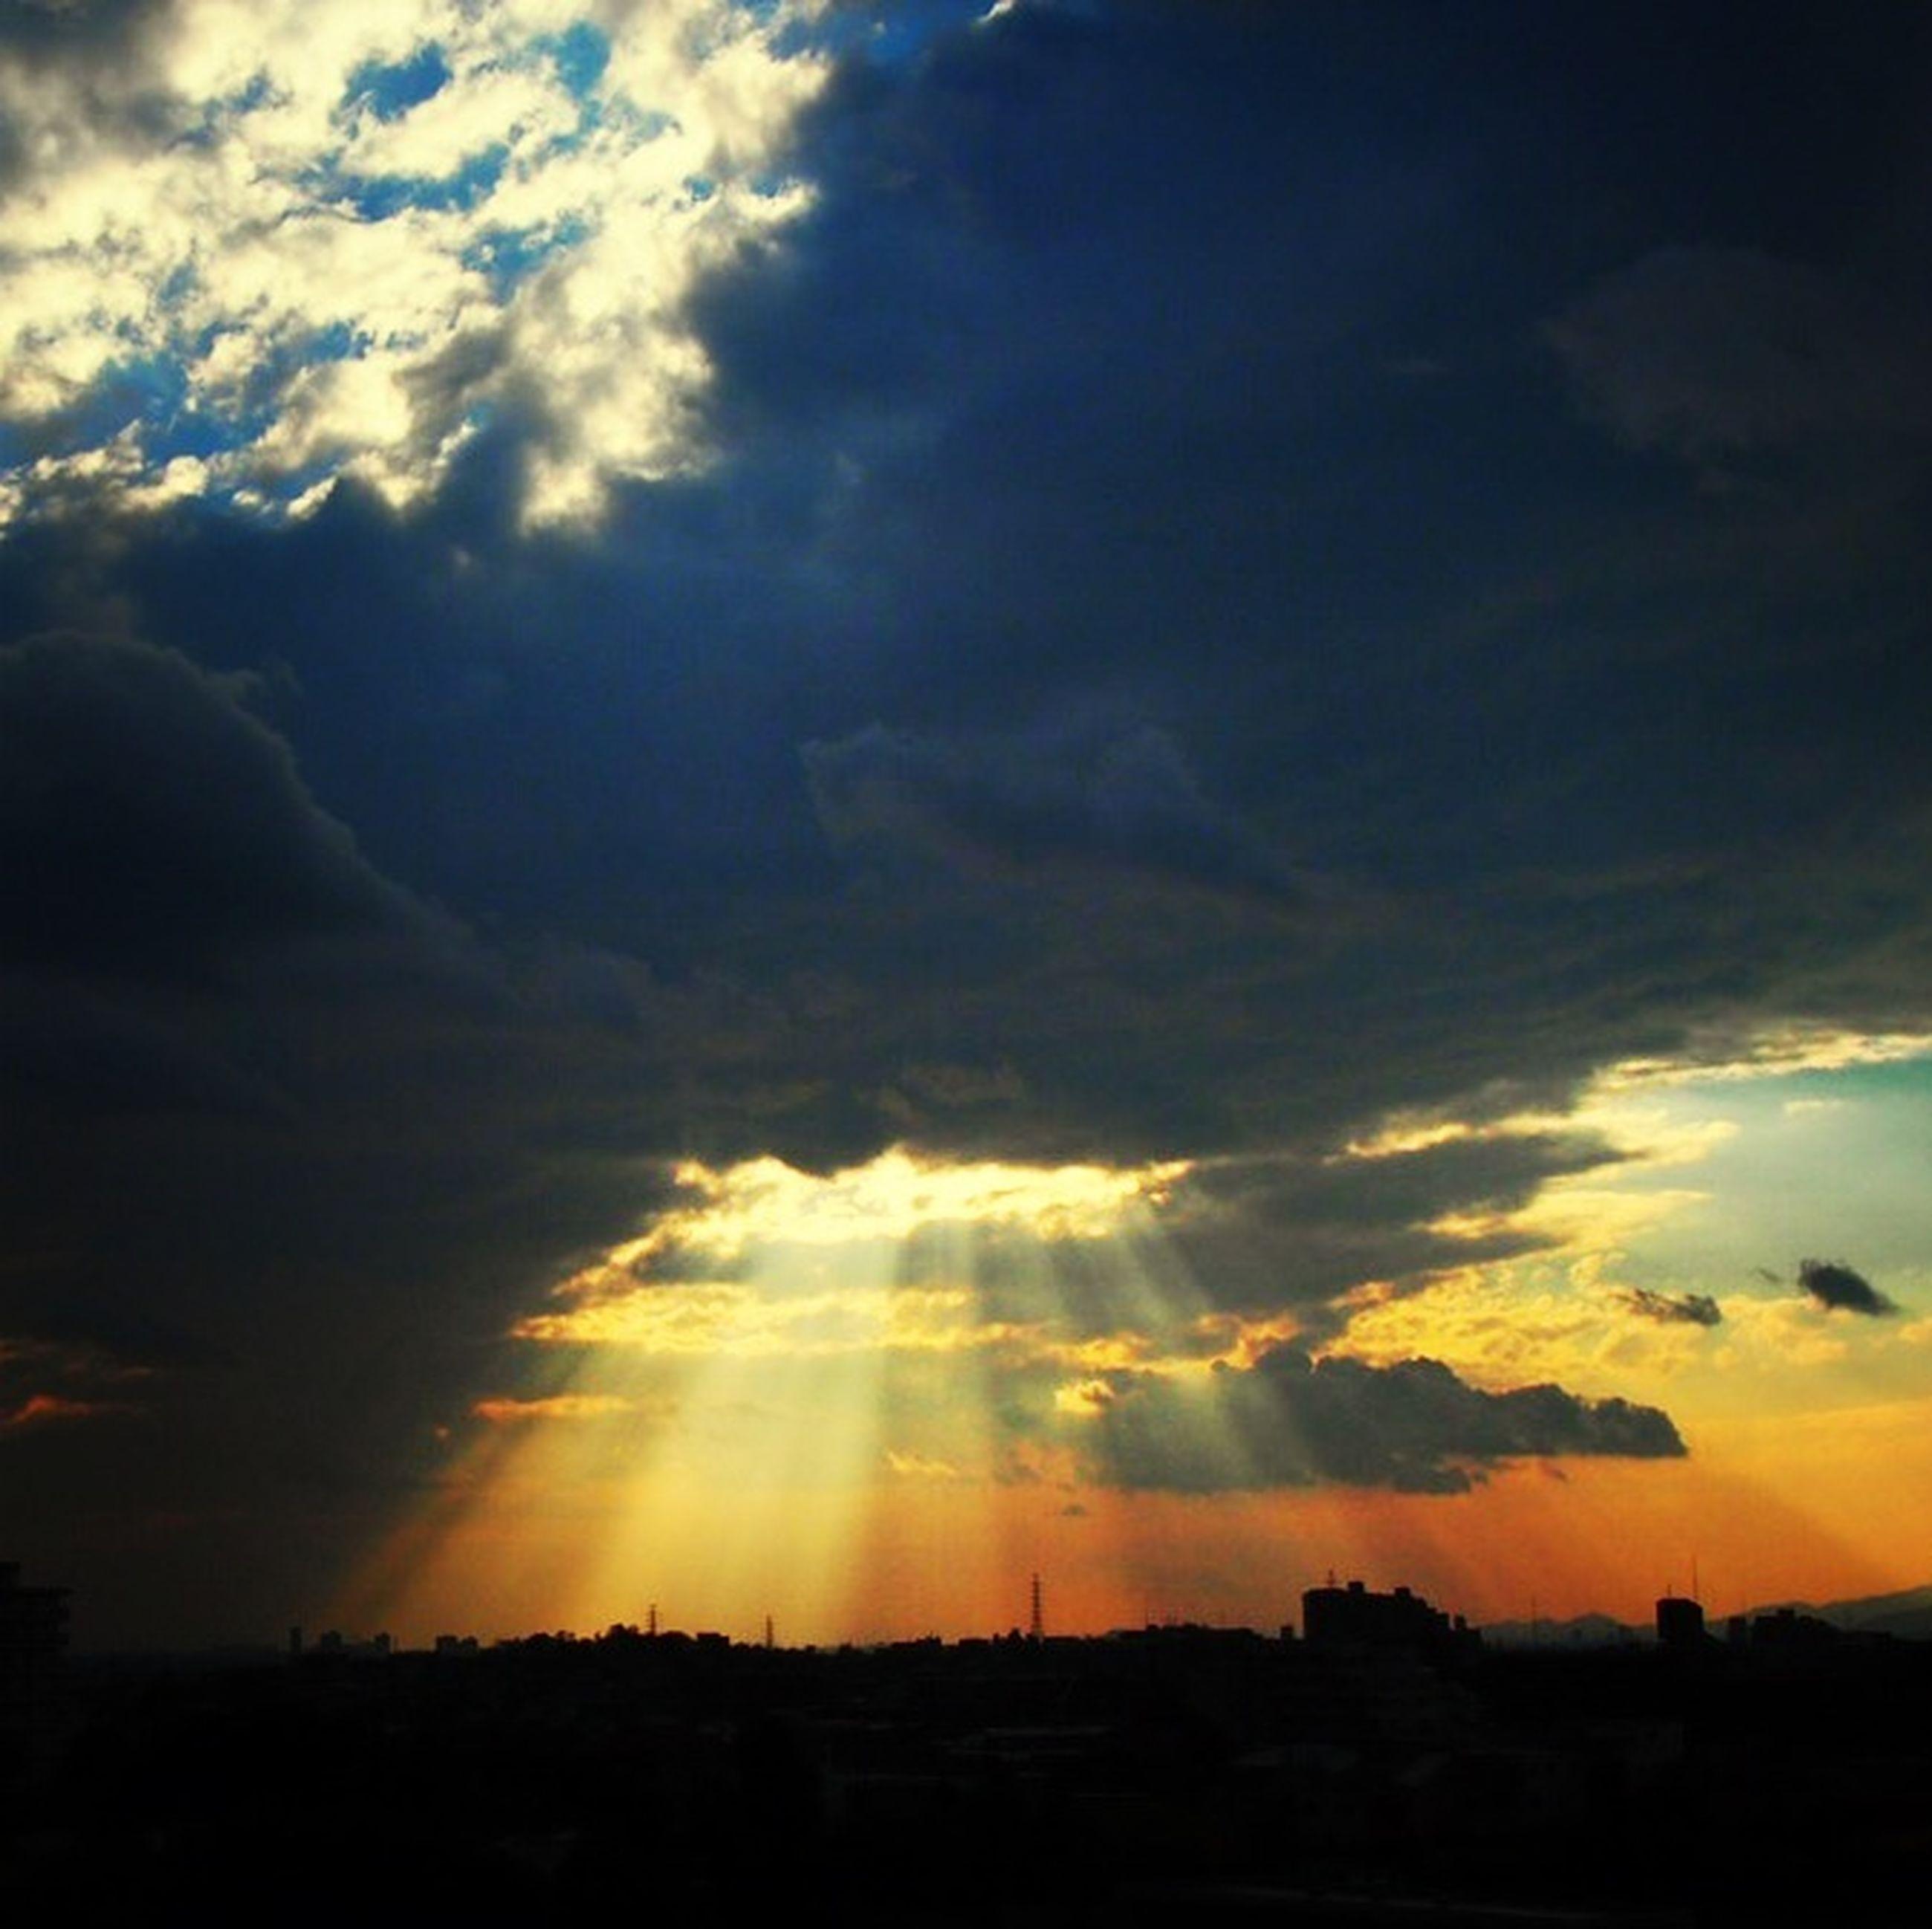 sunset, sky, scenics, silhouette, tranquil scene, beauty in nature, cloud - sky, tranquility, landscape, nature, cloud, idyllic, dramatic sky, cloudy, orange color, moody sky, sunlight, outdoors, majestic, cloudscape